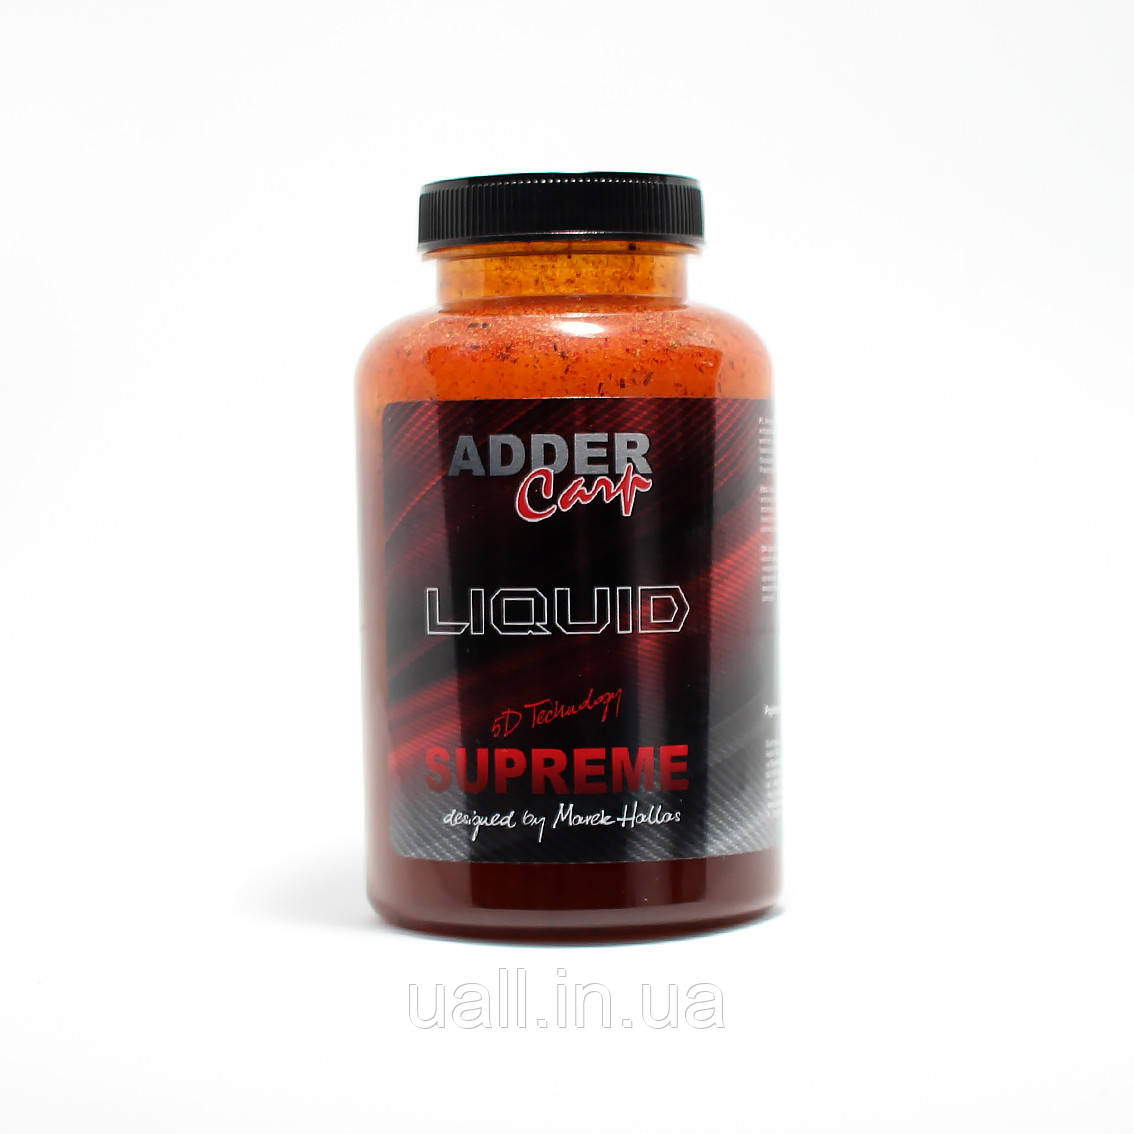 Liquid Adder Carp Magic SUPREME 5D Peach Ananas 300ml (Персик Ананас)